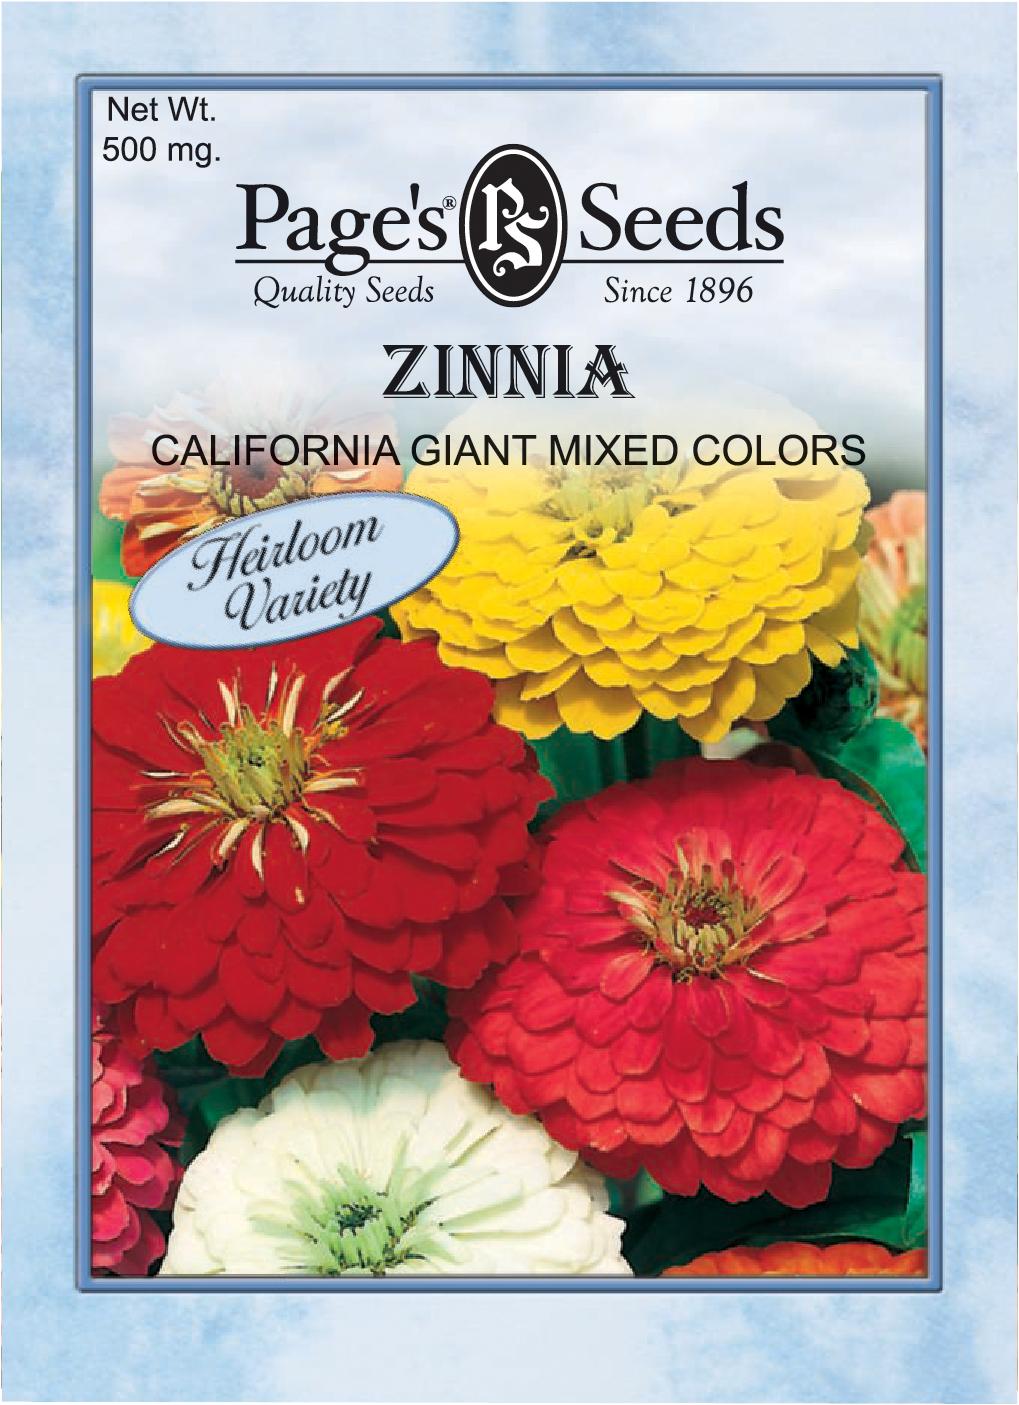 Zinnia, California Giant Mix | The Page Seed Company, Inc